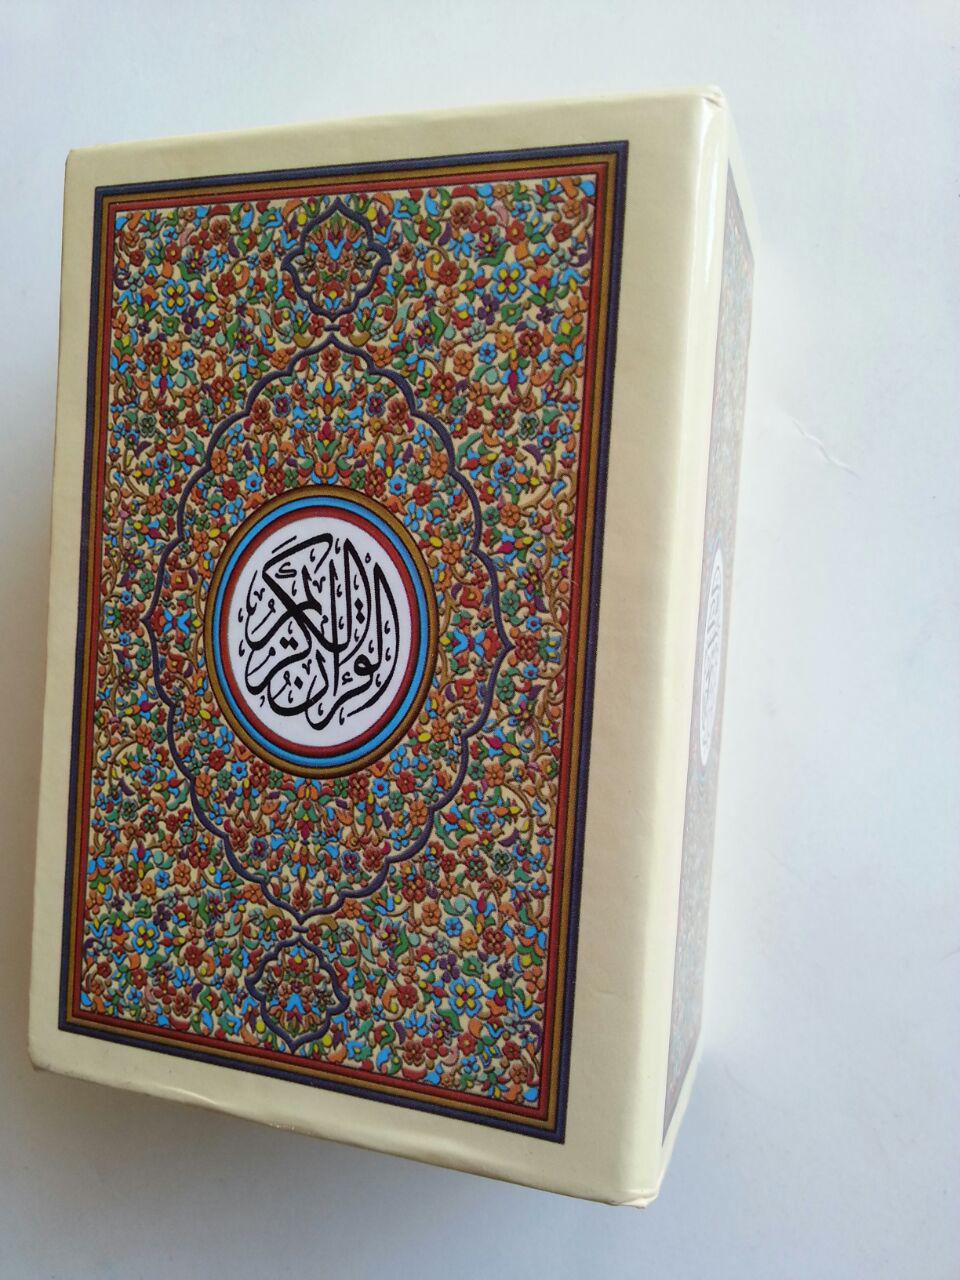 Al-Qur'an Impor Per Juz Tanpa Terjemah Ukuran 7x10 cover